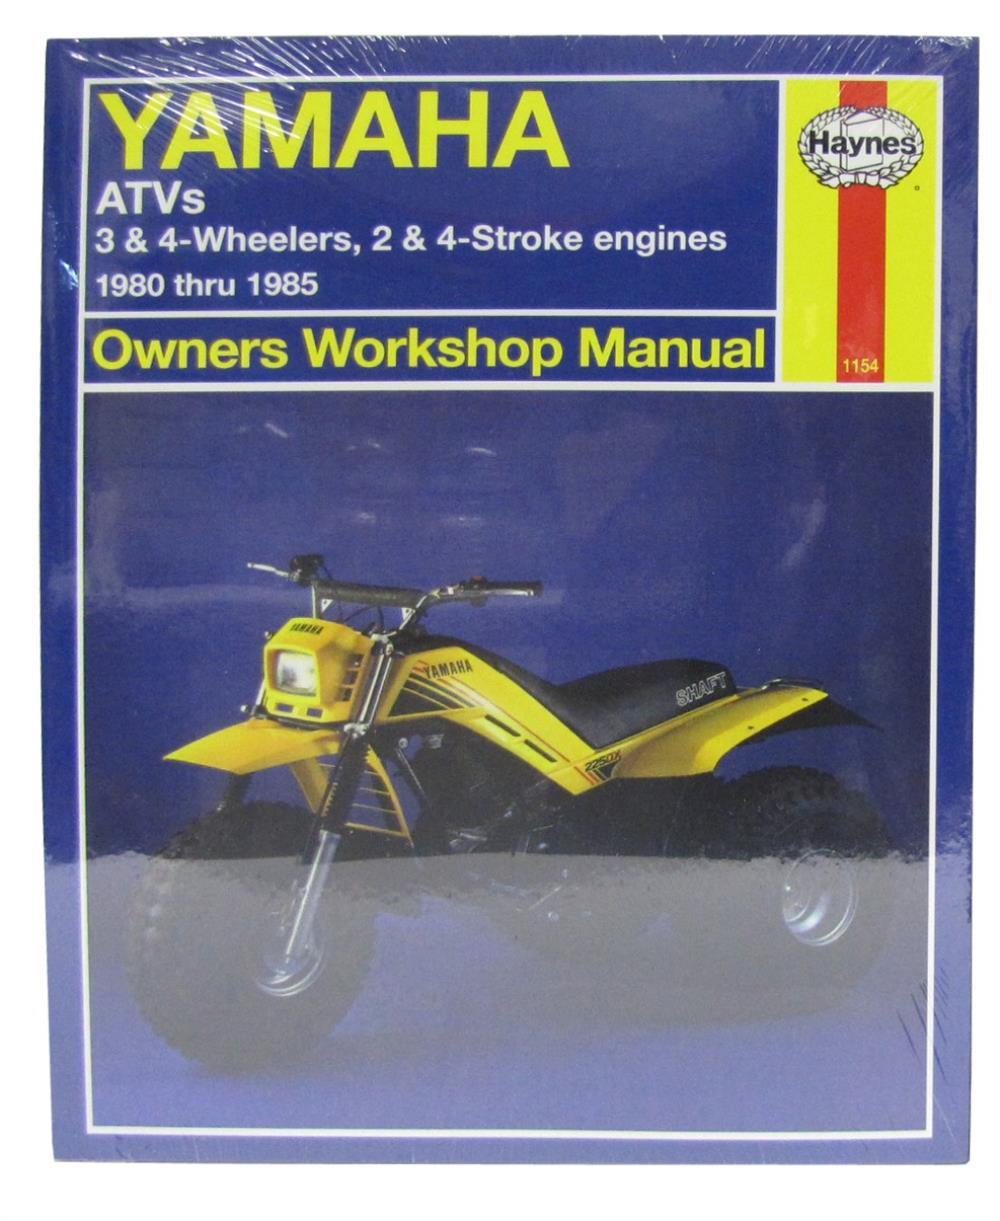 85 86 yamaha yfm200 moto 4 atv service repair manual pdf.